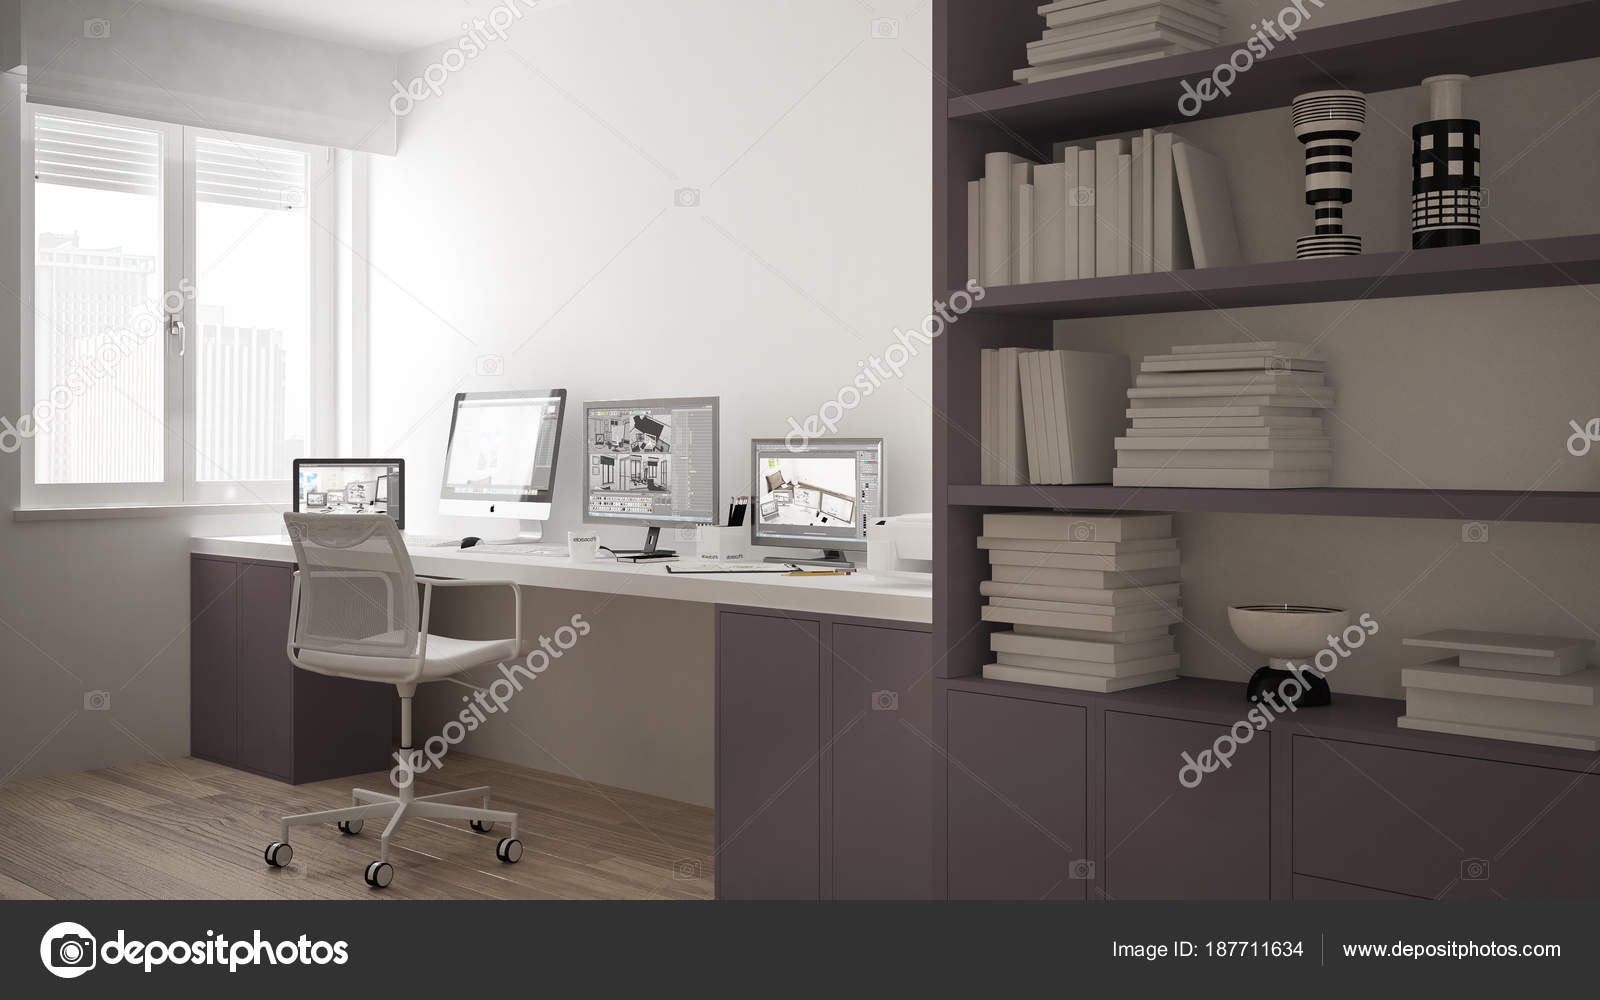 https://st3.depositphotos.com/1152281/18771/i/1600/depositphotos_187711634-stockafbeelding-moderne-werkplek-in-minimalistische-huis.jpg